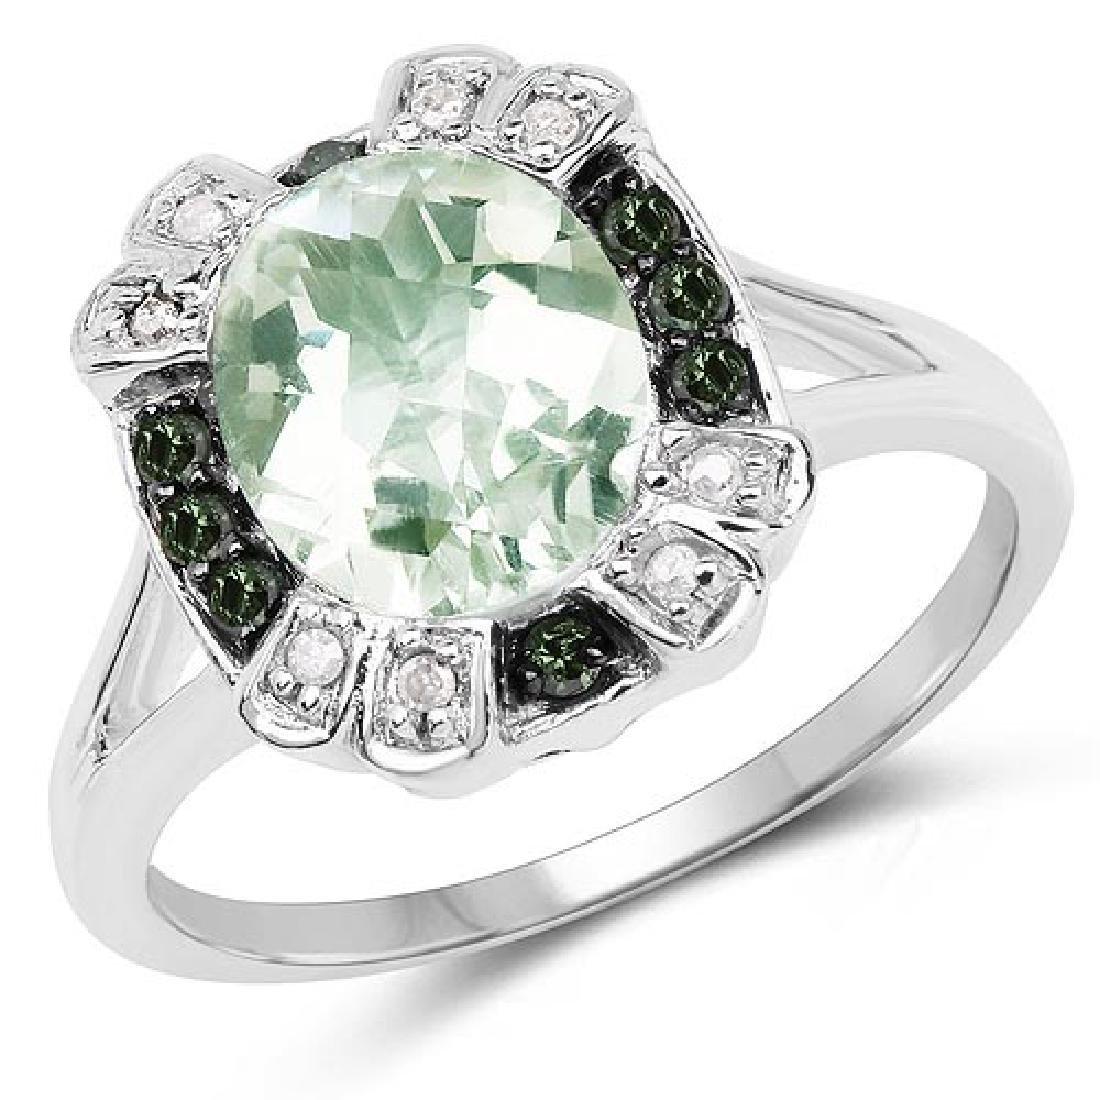 2.82 Carat Genuine Green Amethyst Green Diamond and Wh